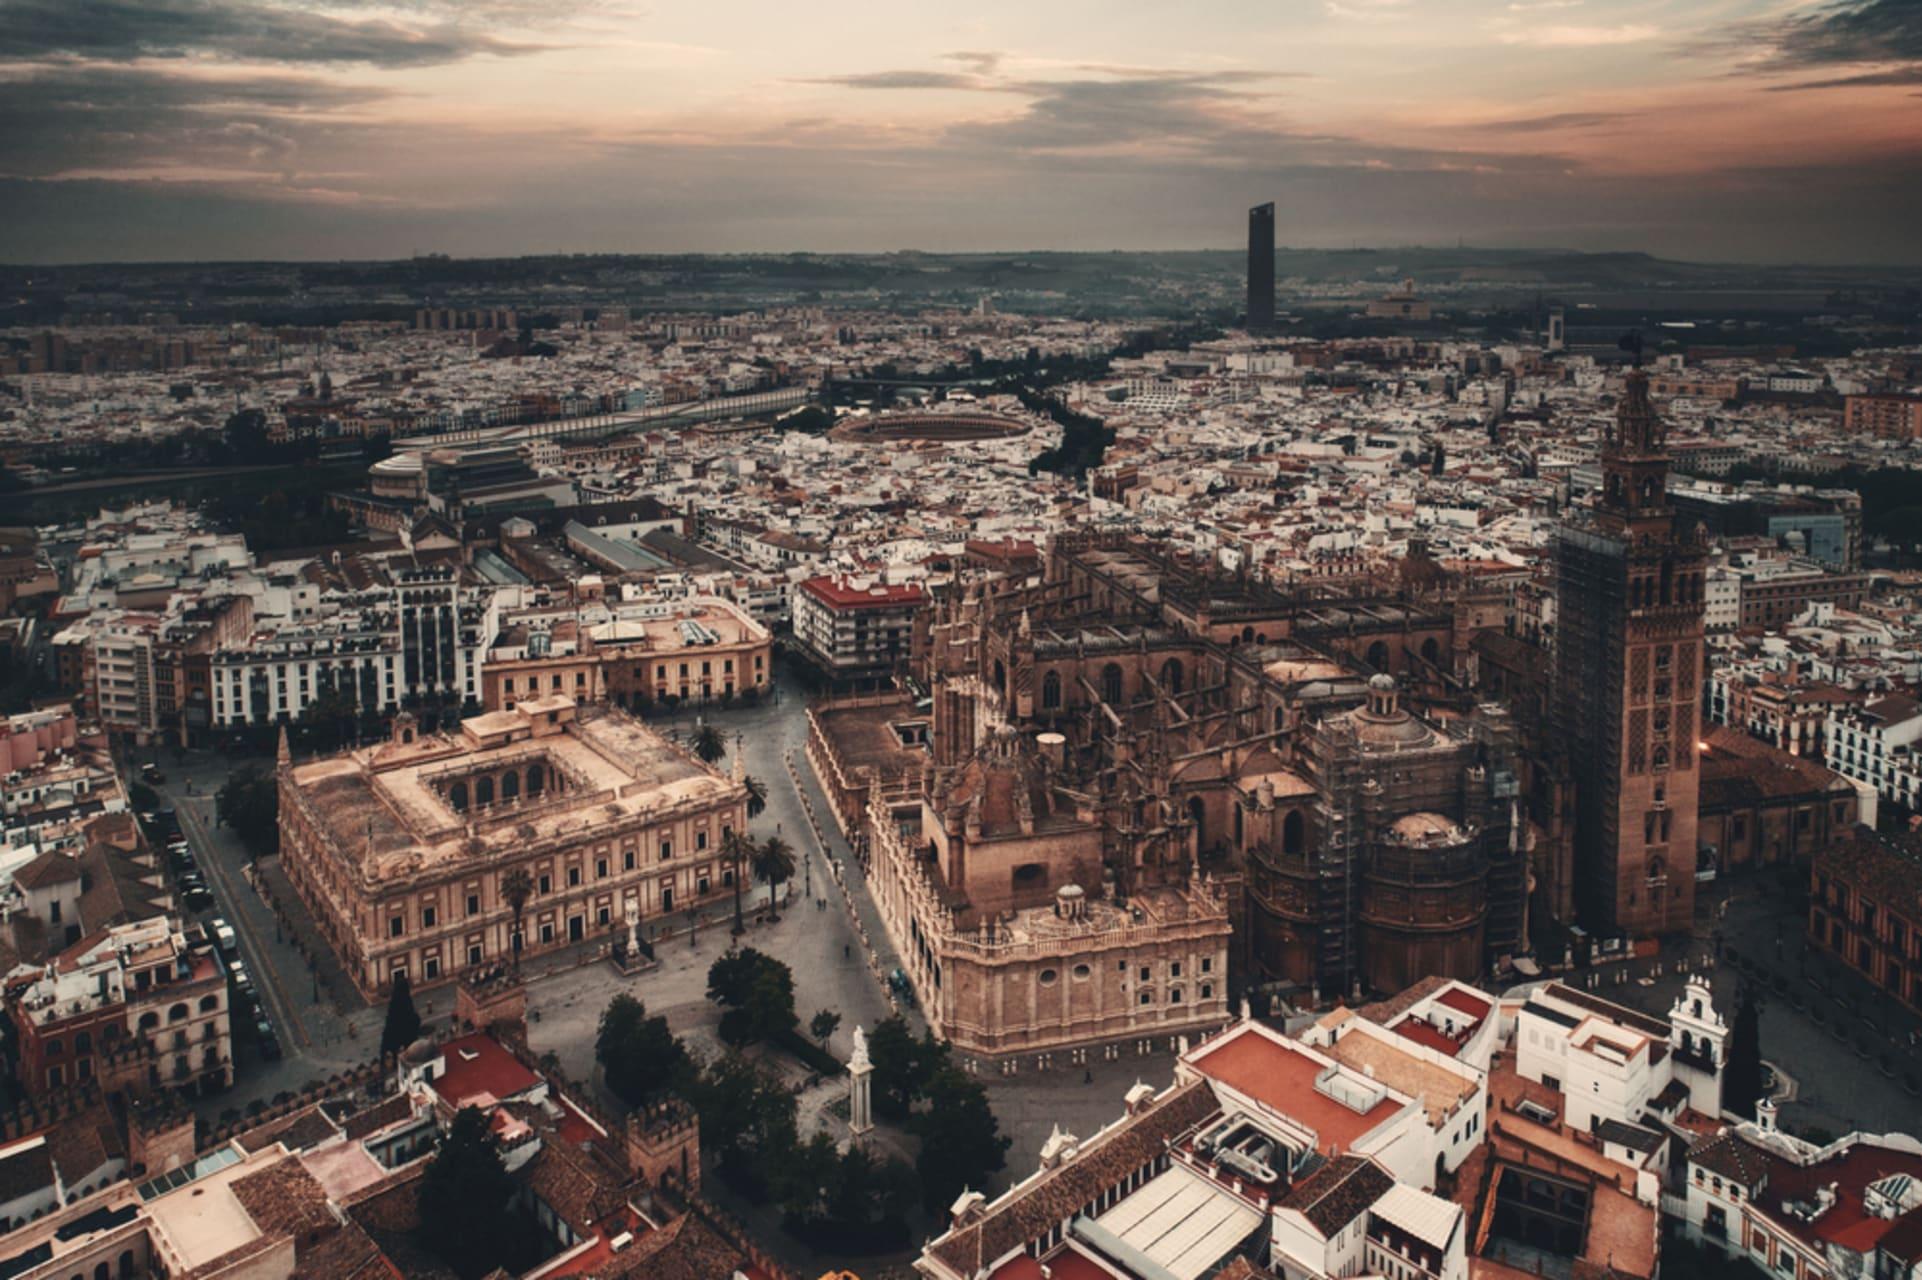 Seville - The Maze Game!